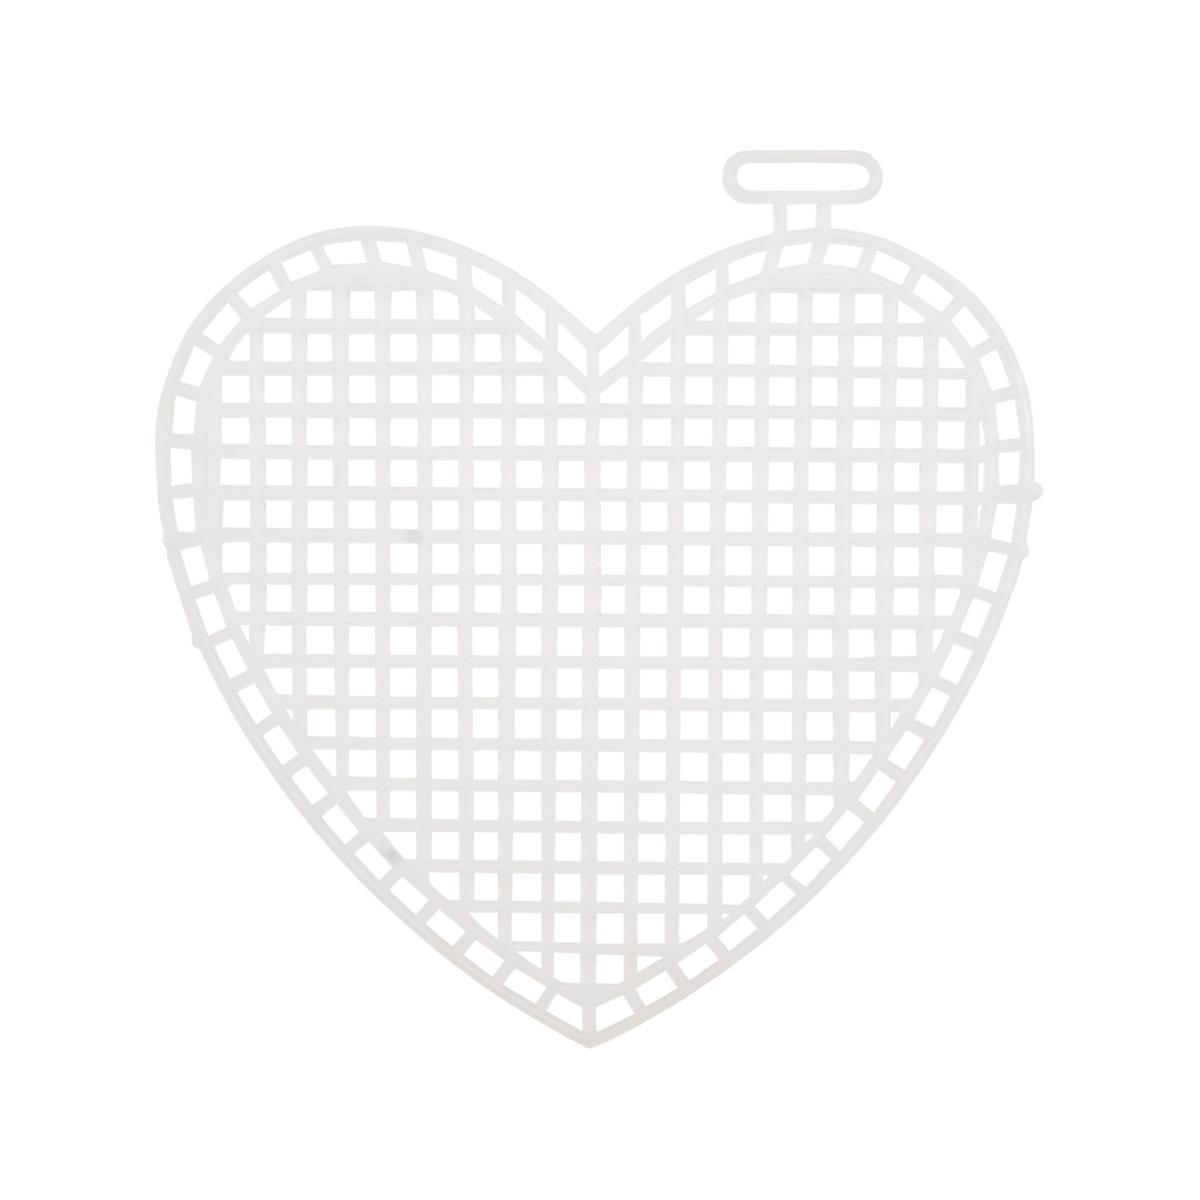 Канва пластикик, мал. 'Сердце', 7*8 см, Bestex